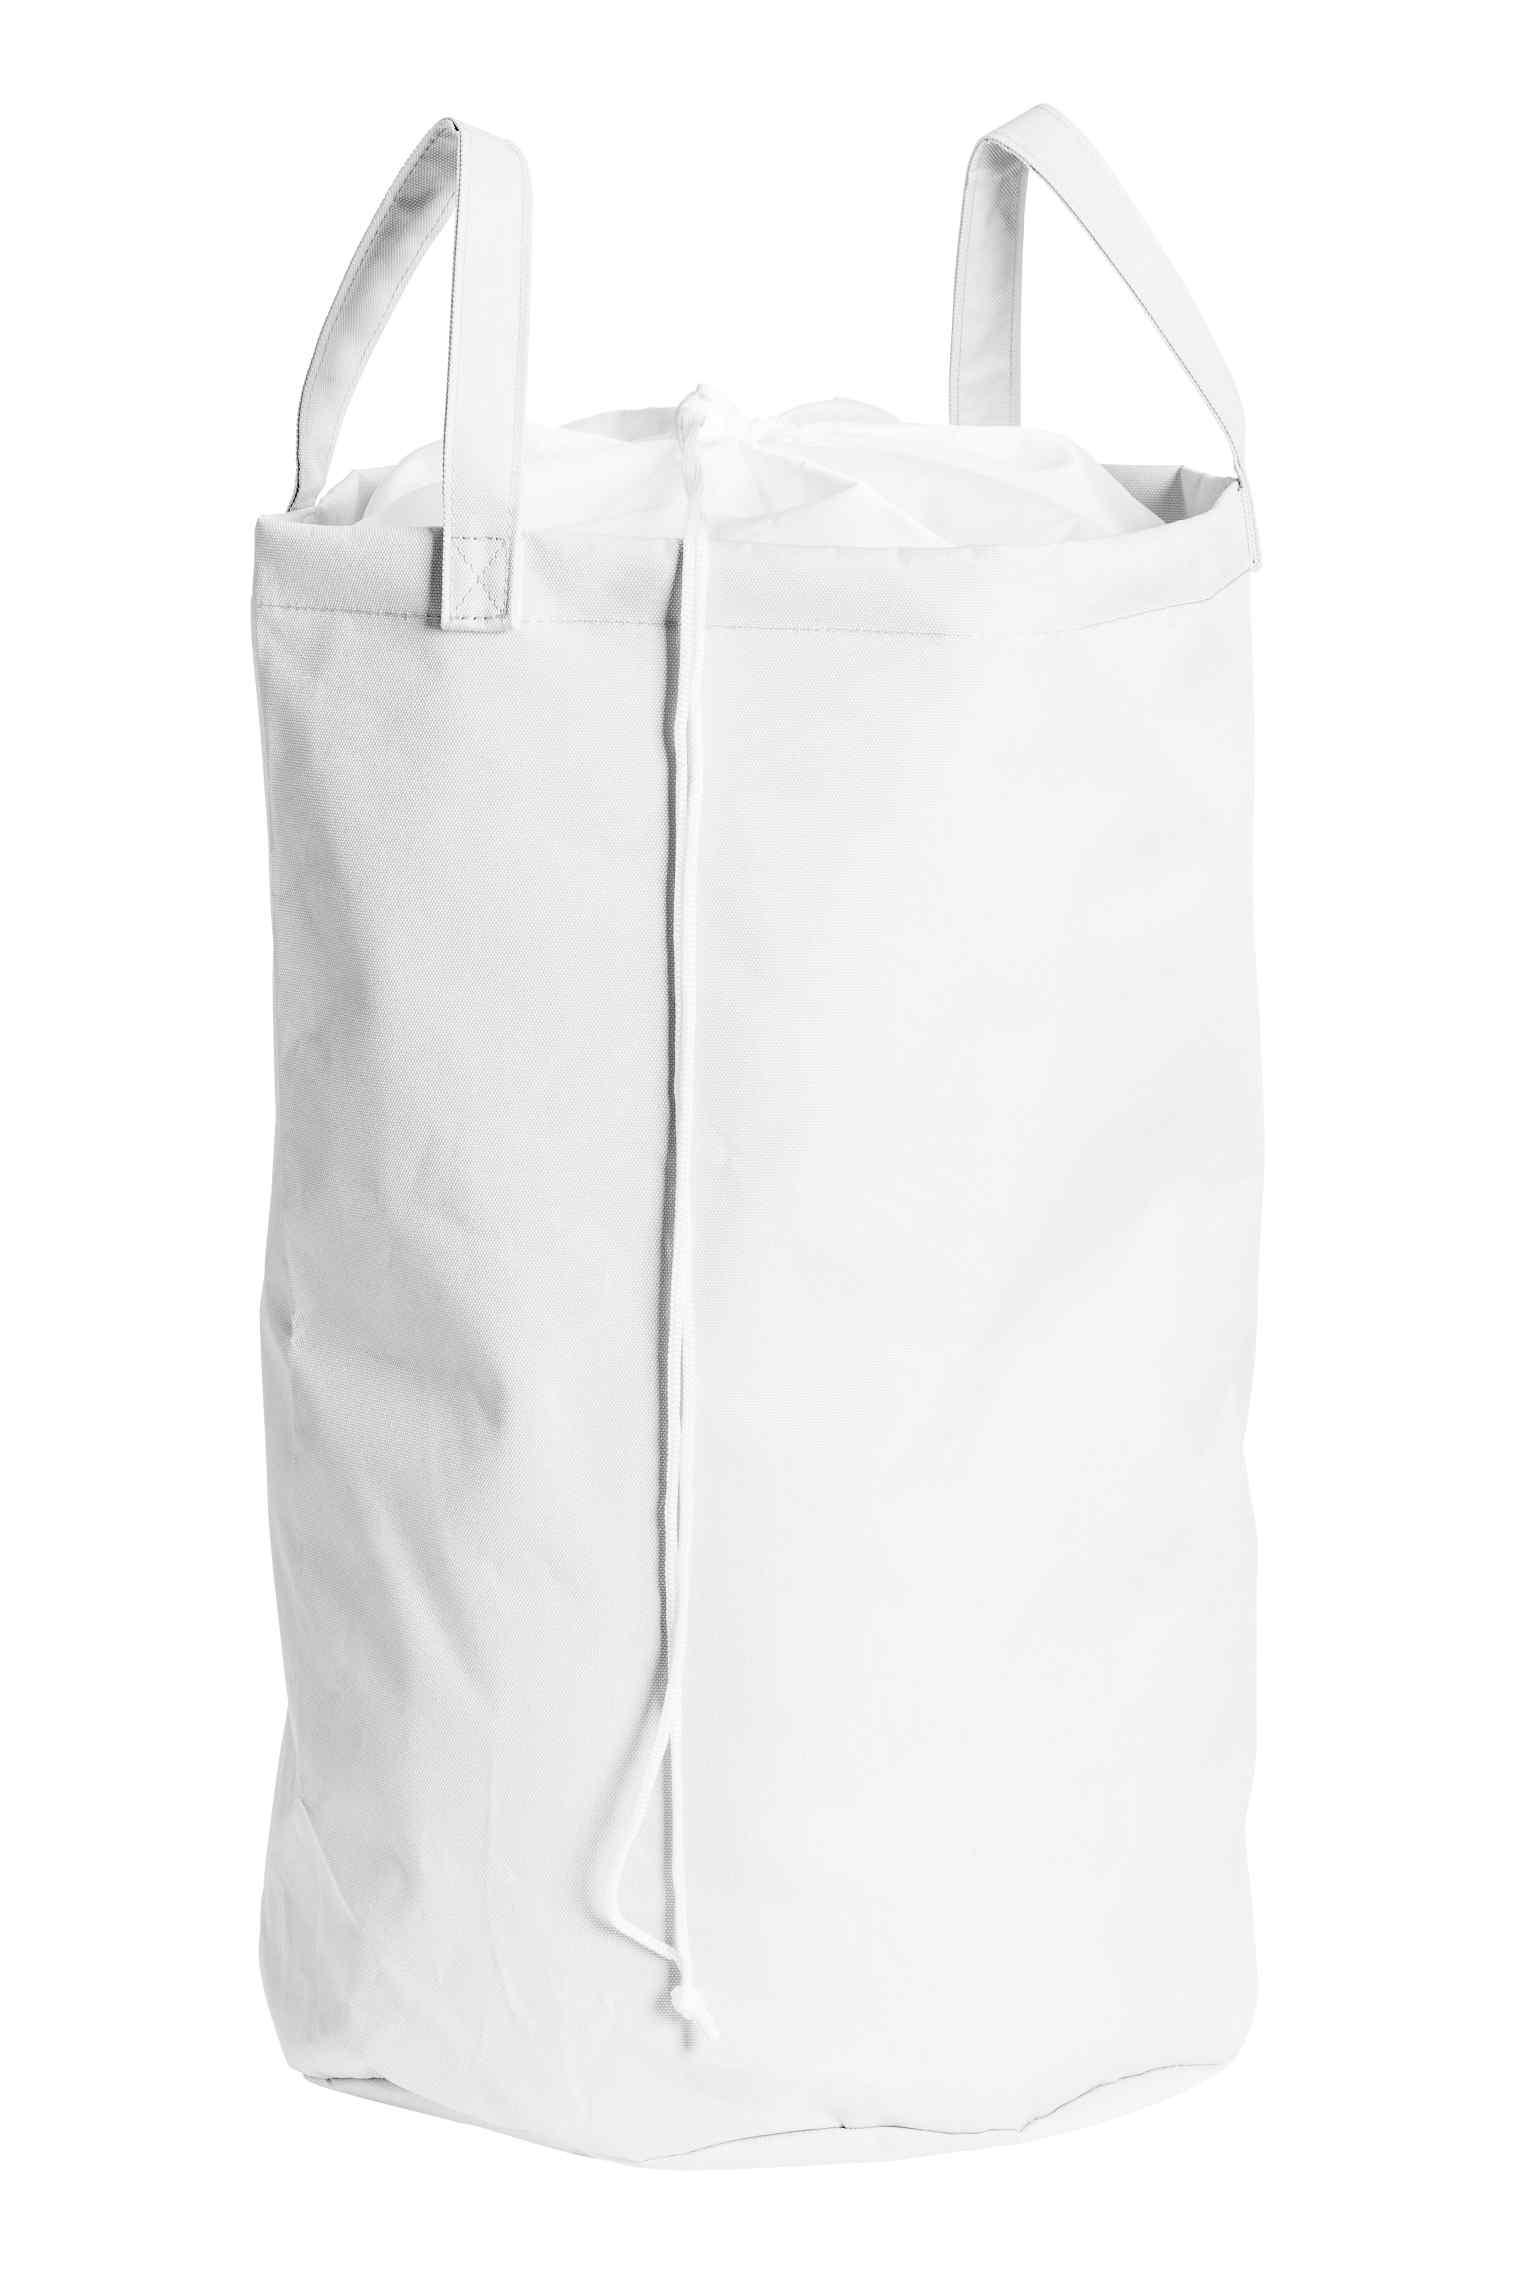 Laundry bag, $15